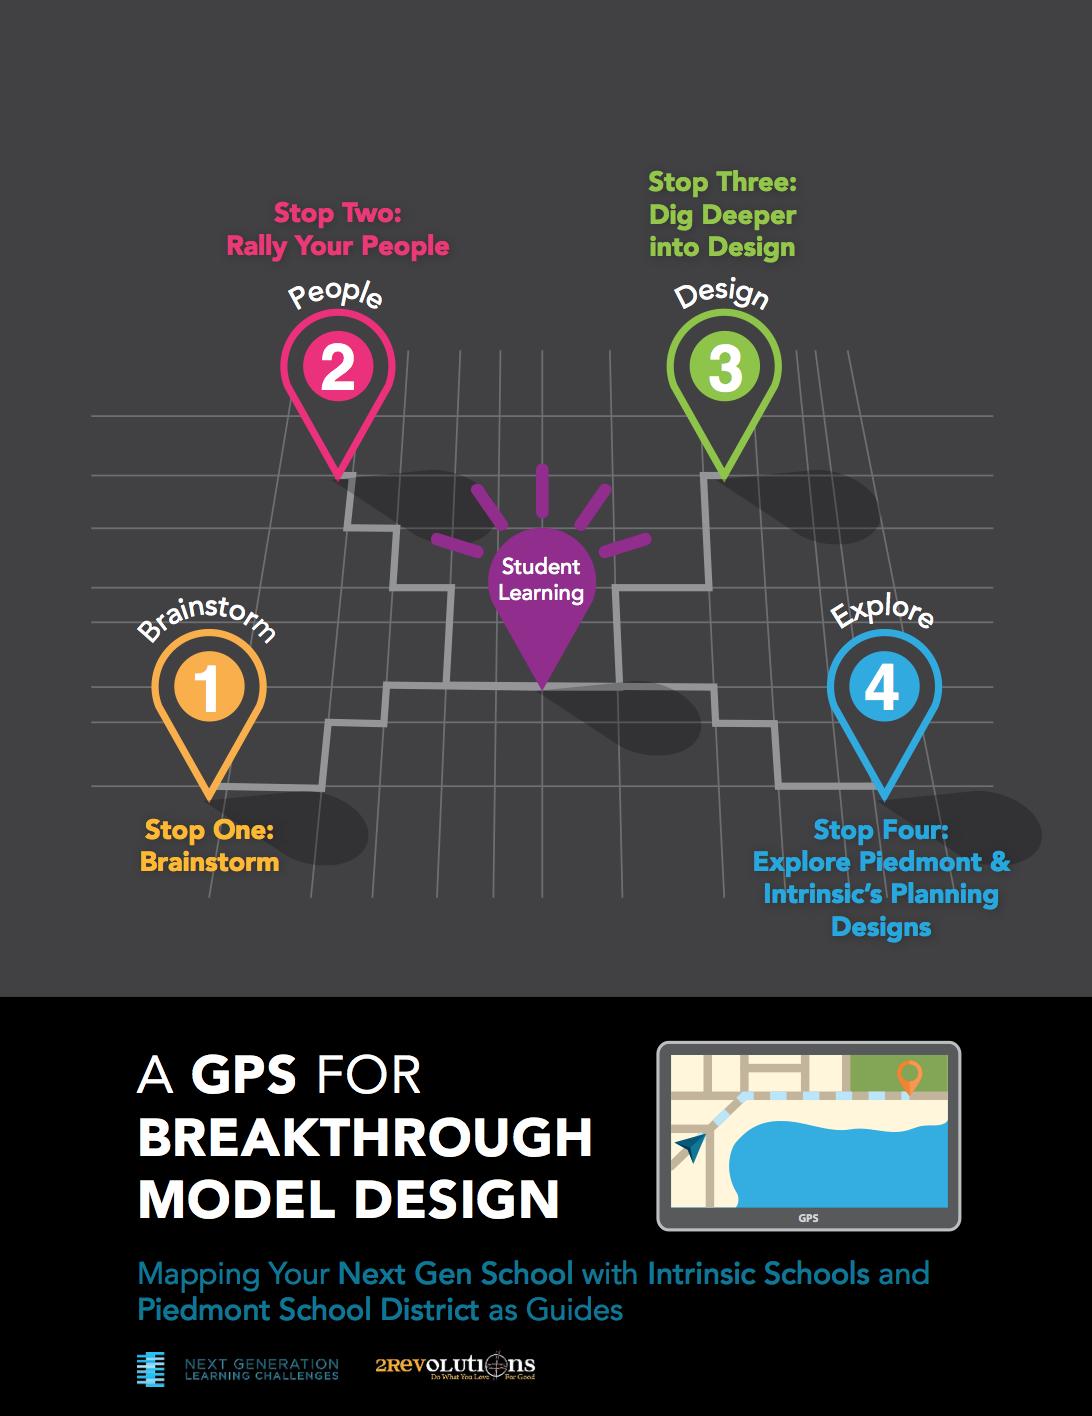 a gps for breakthrough model design, april 2016